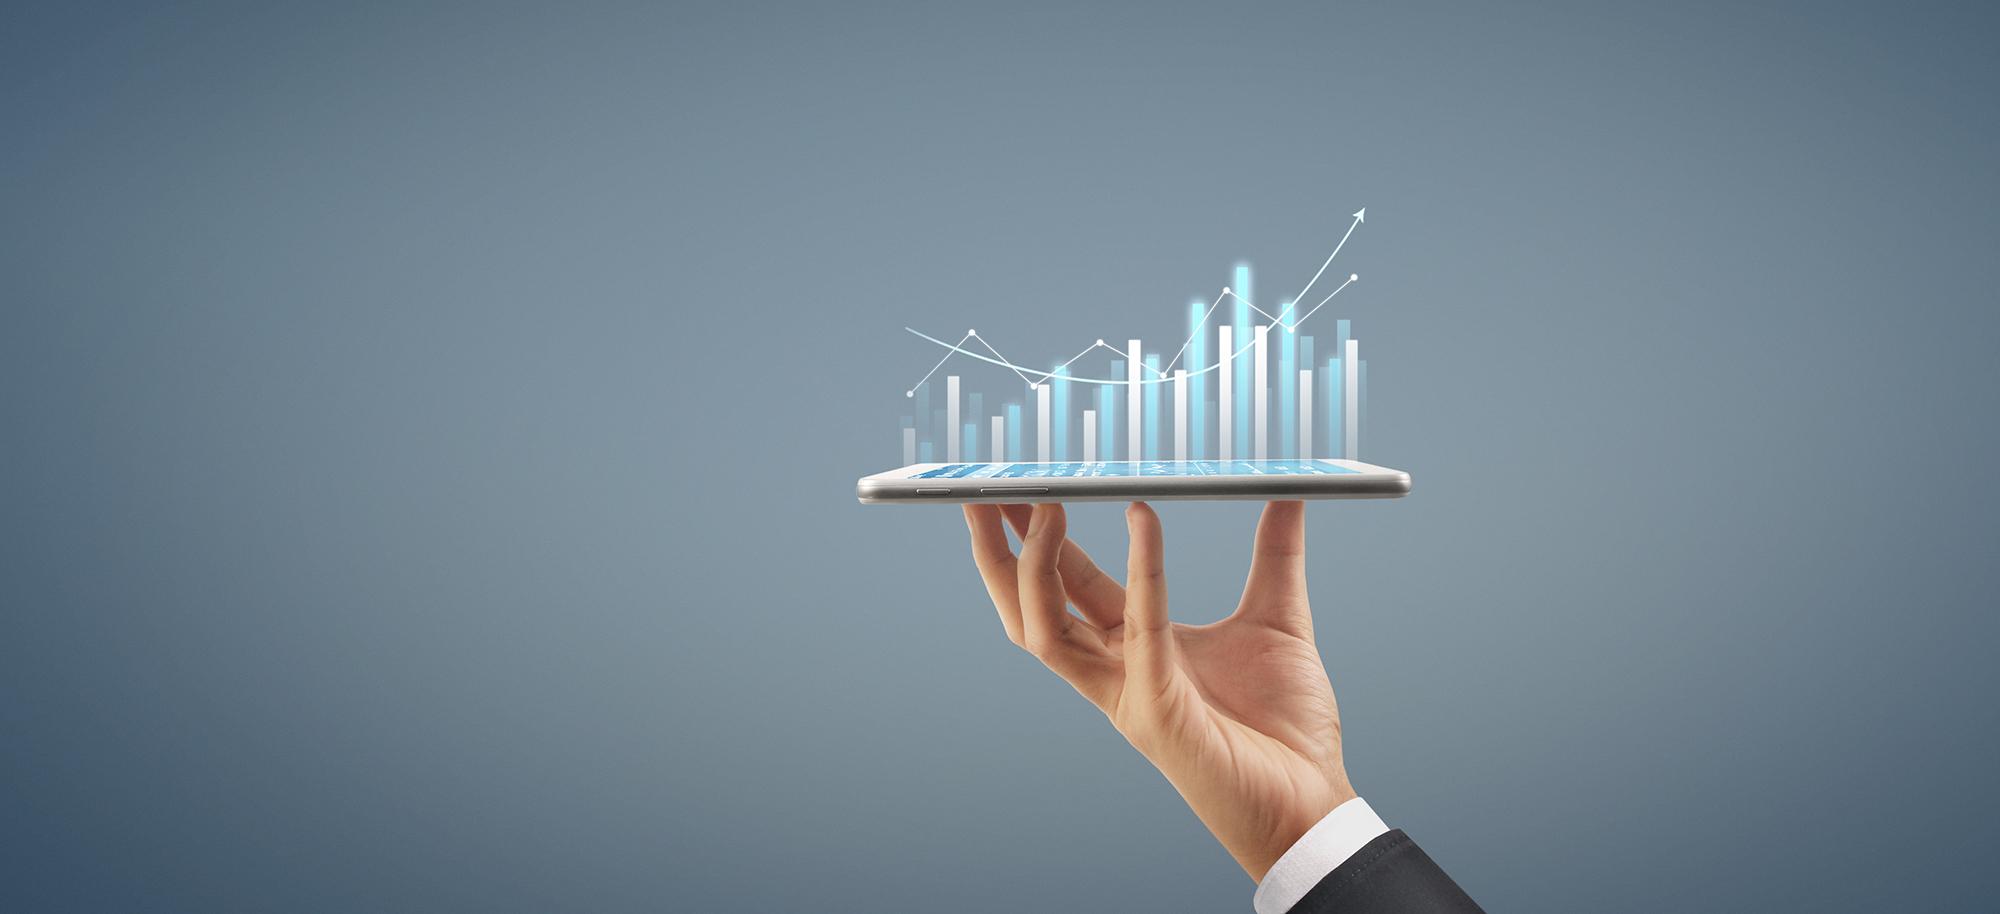 BTC ETH BSV XRP LTC BAT ve EOS Fiyat Analizi 29 Eylul 2020